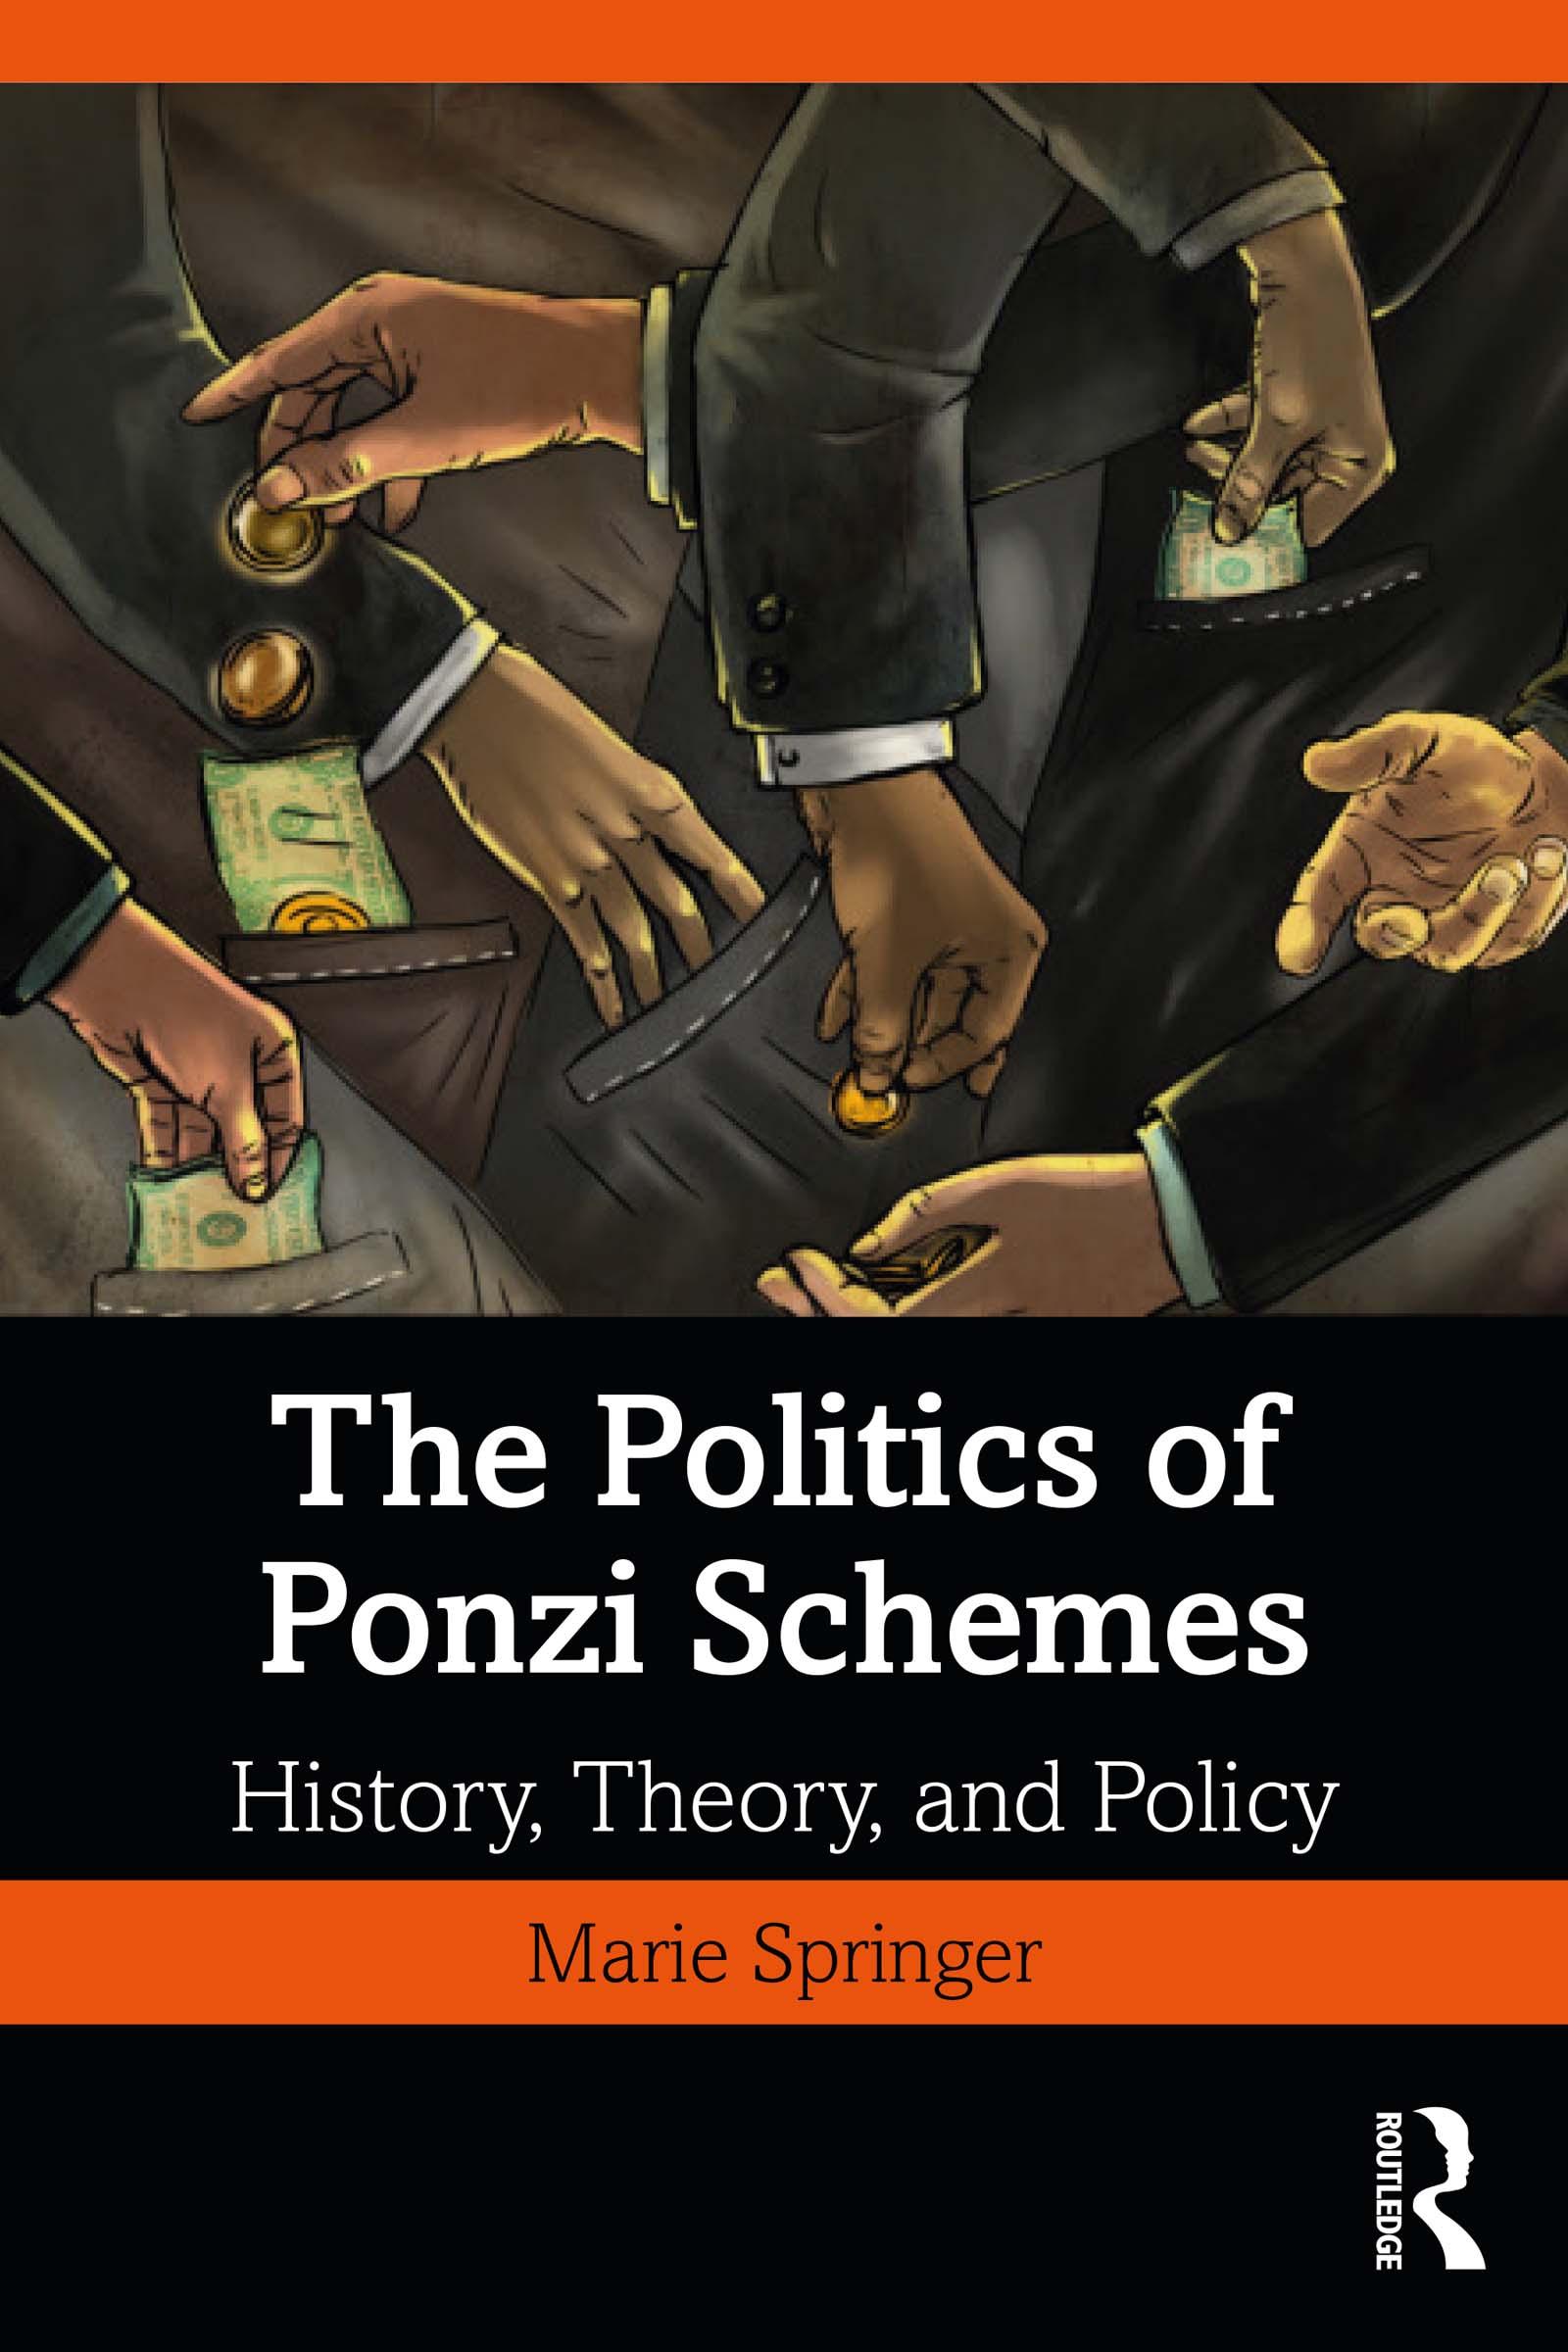 The Politics of Ponzi Schemes